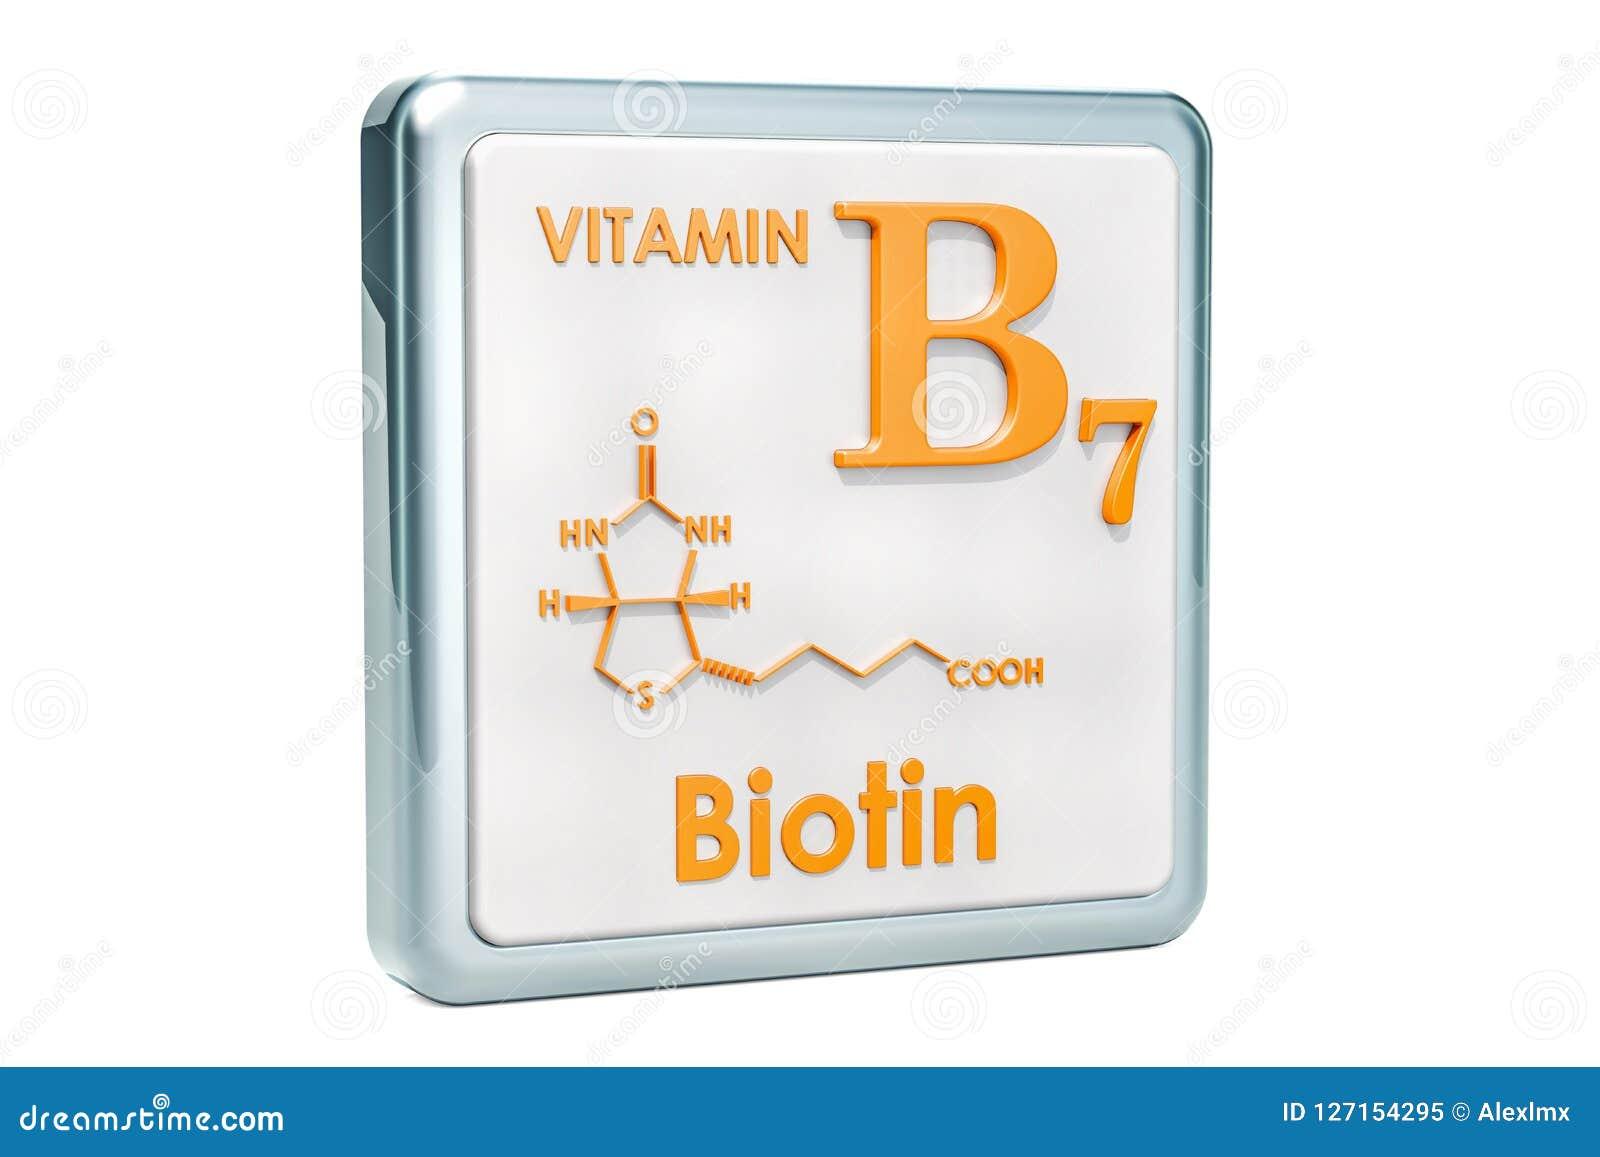 Vitamina B7 Biotina Icono Fórmula Química Estructura